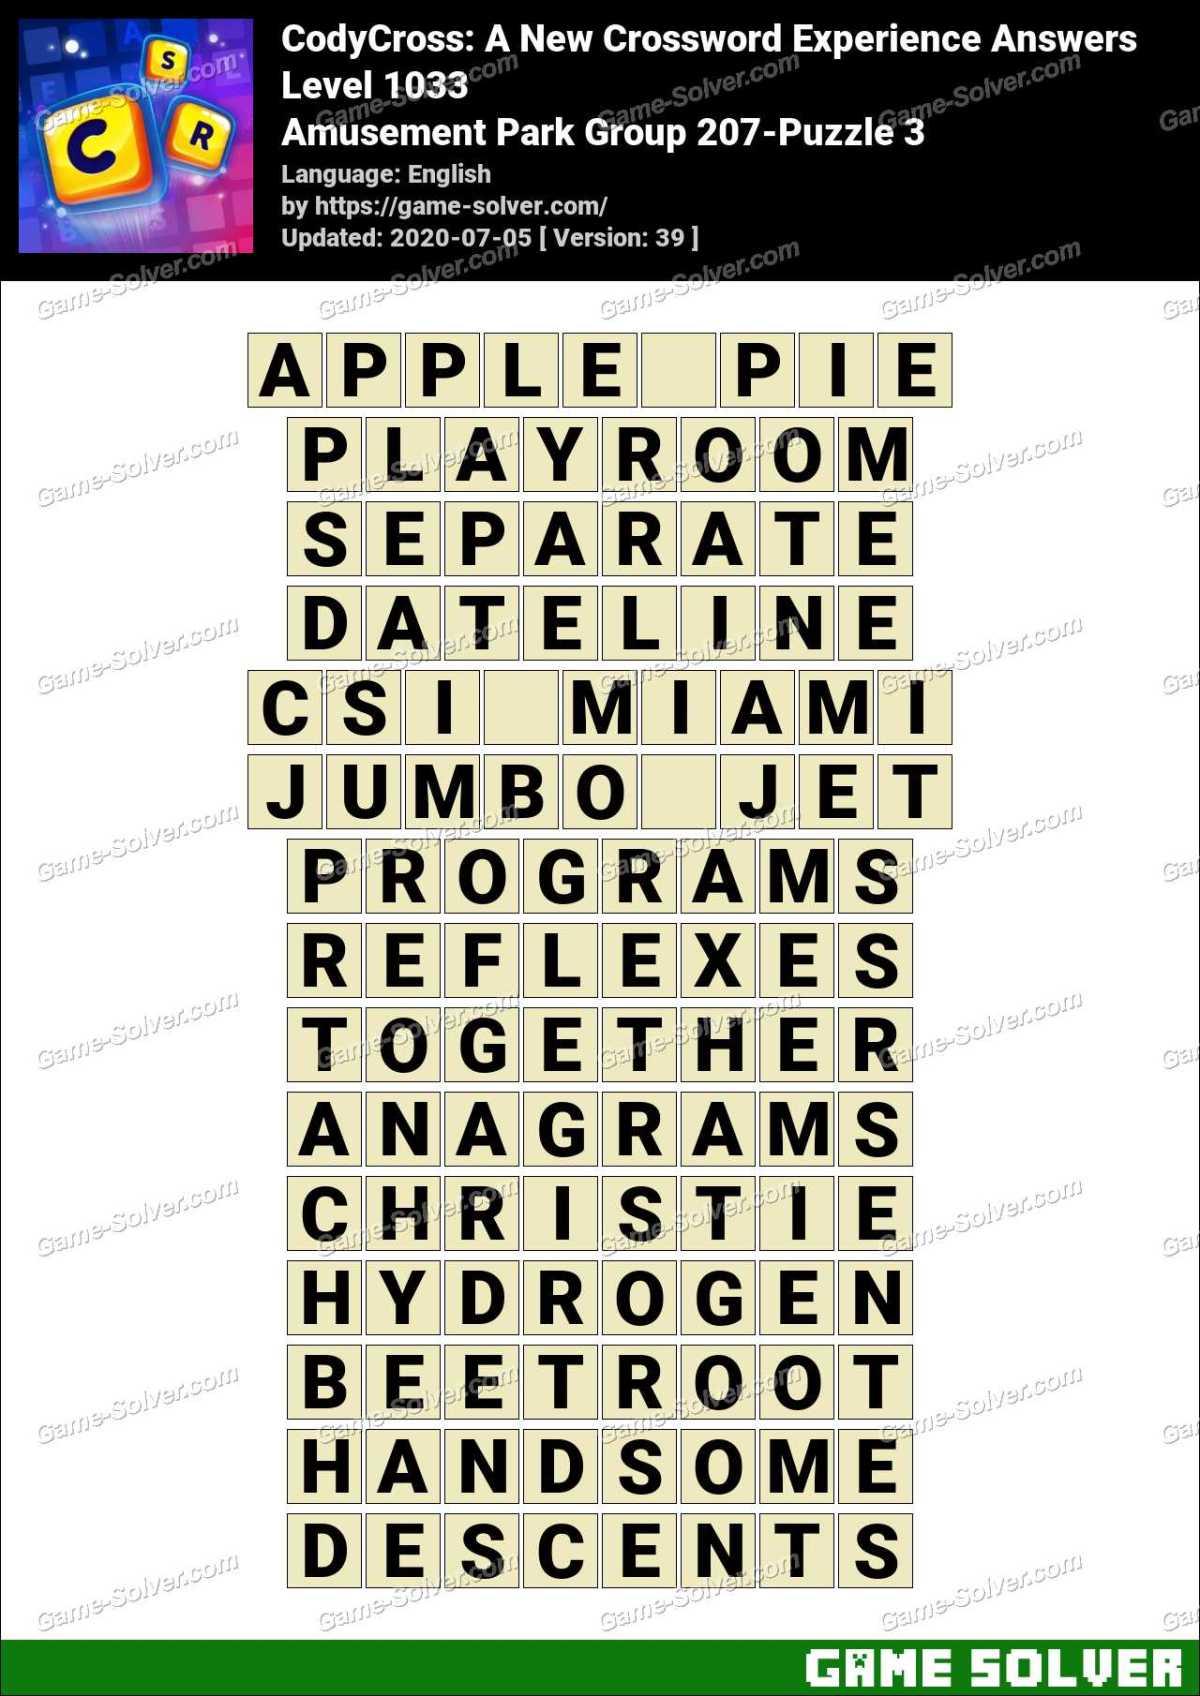 CodyCross Amusement Park Group 207-Puzzle 3 Answers